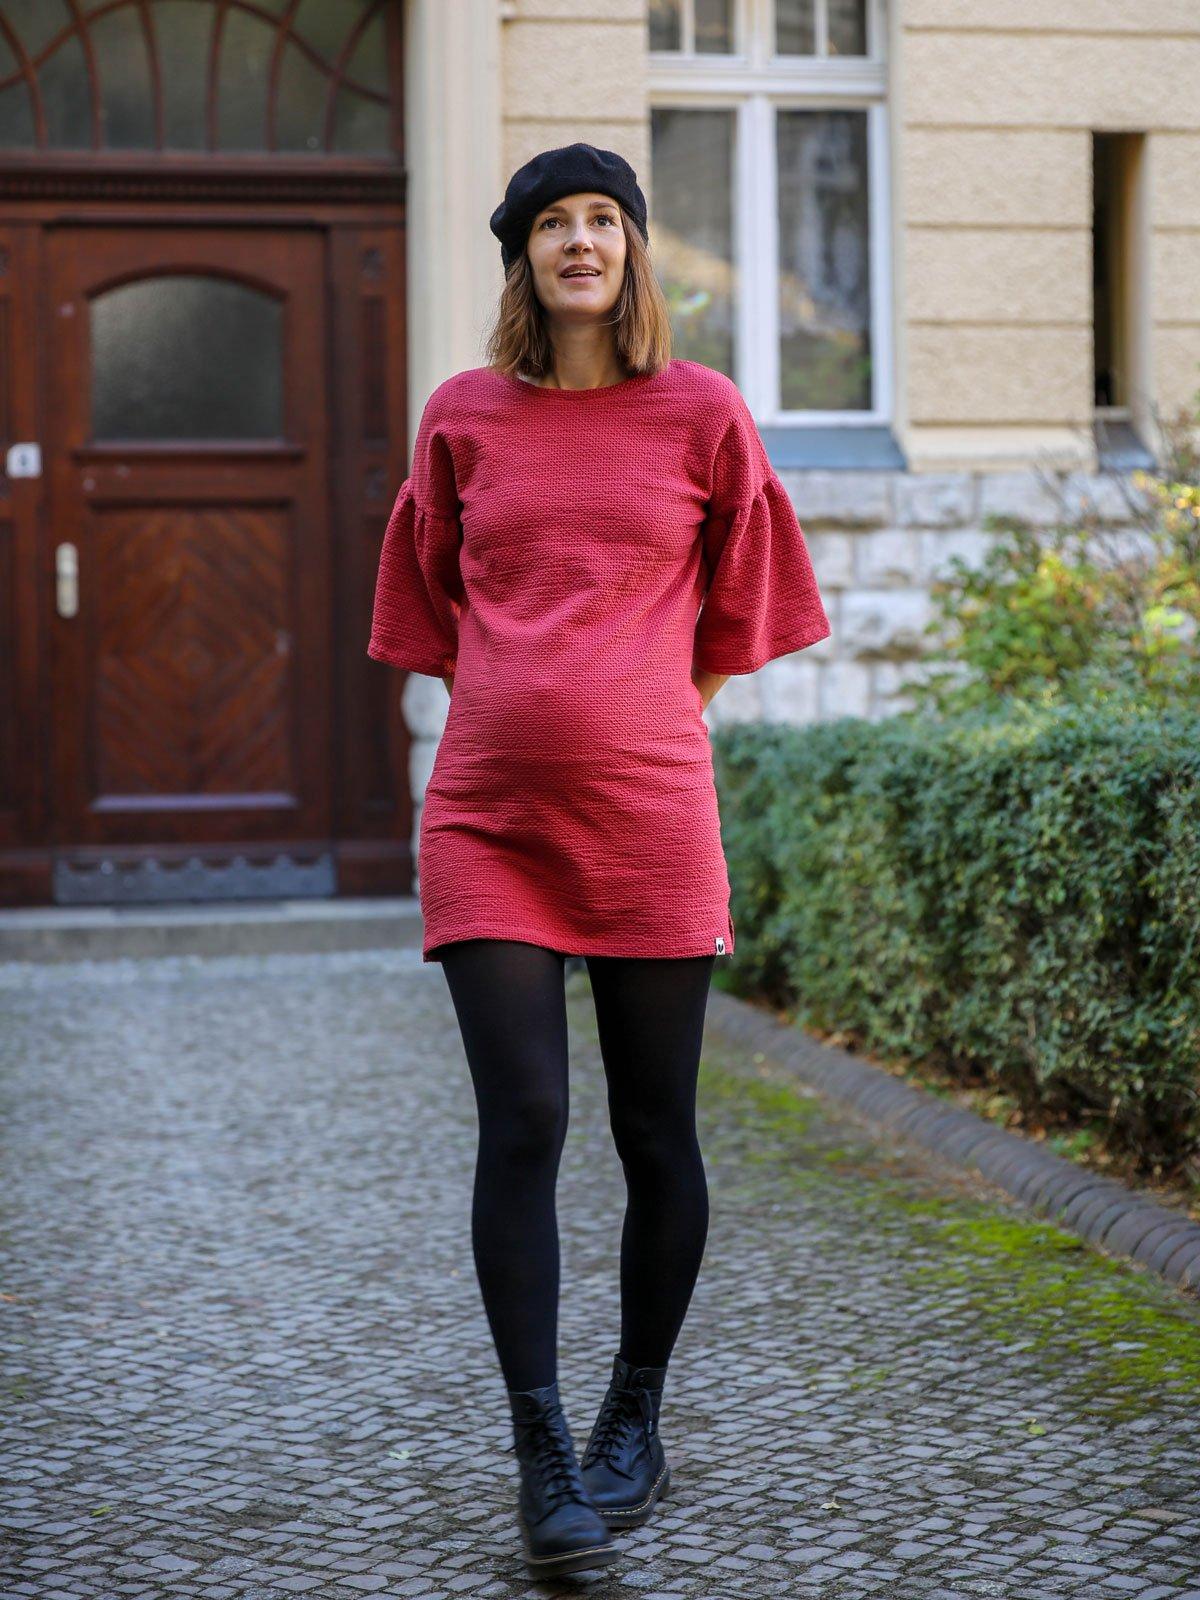 Rotes Fair Fashion Kleid von Lovjoi